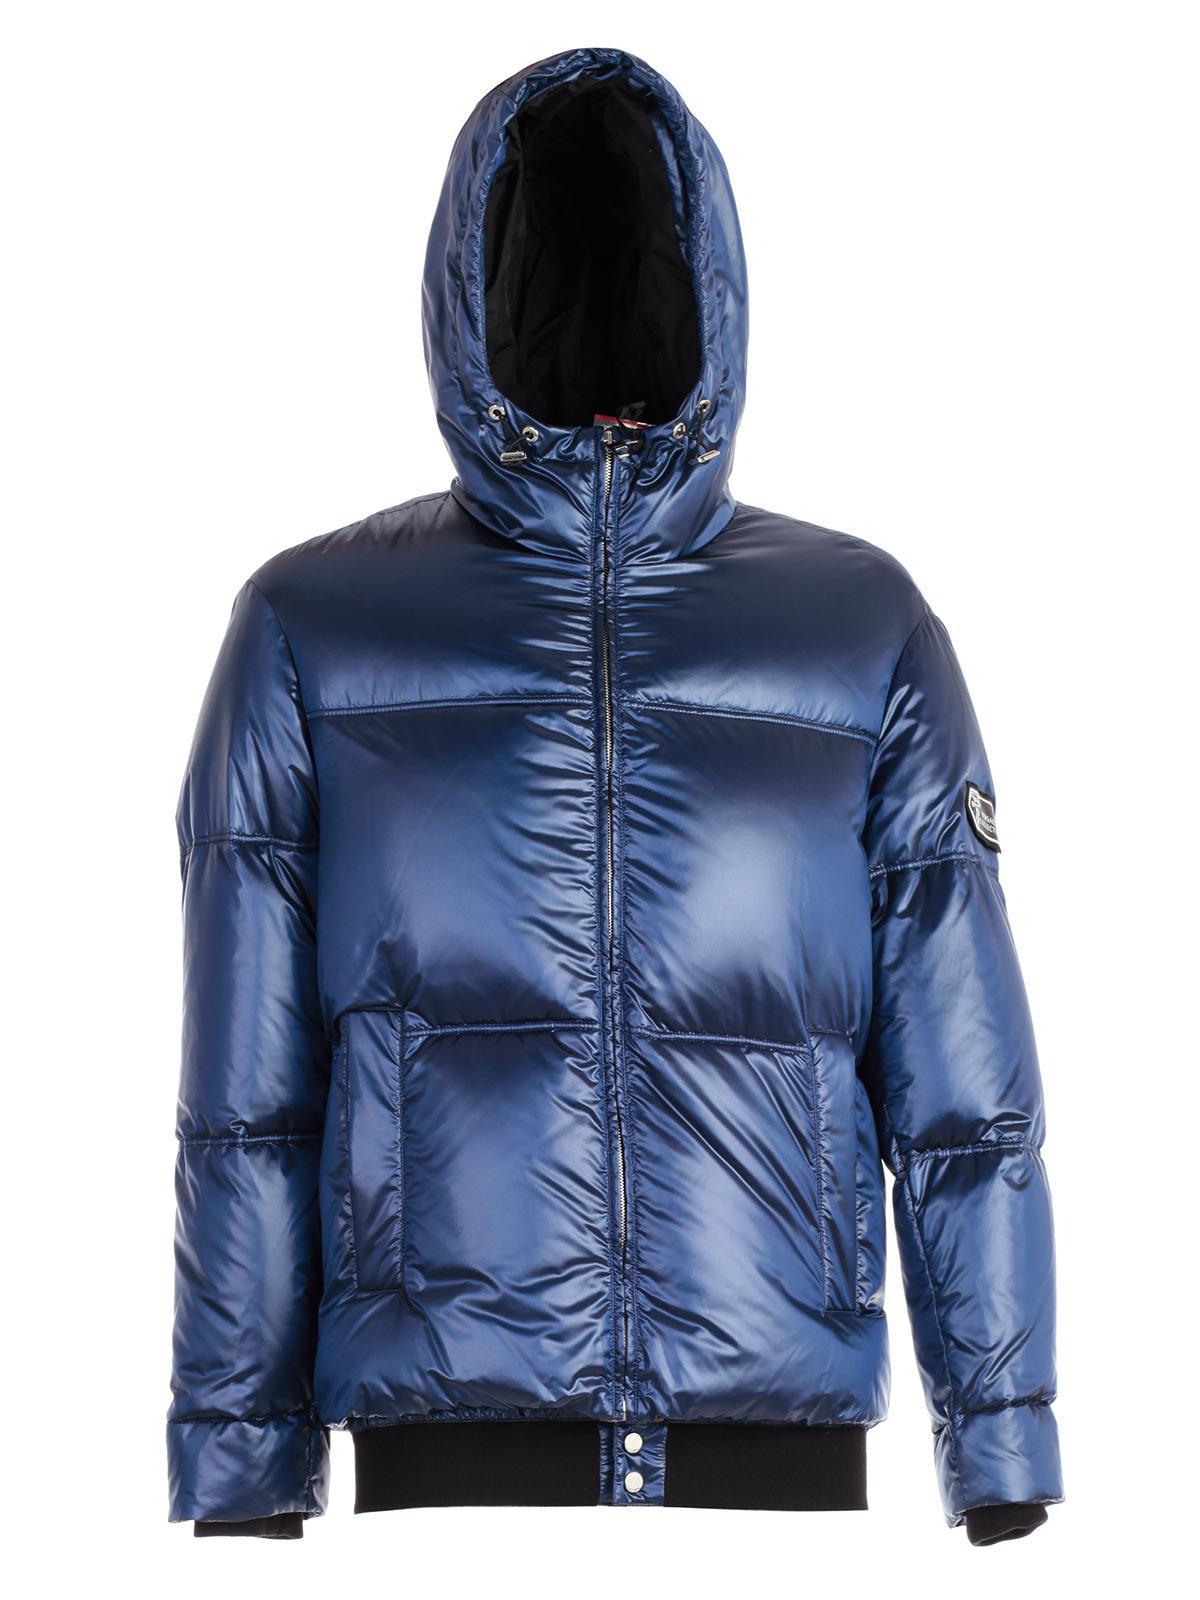 classic fit 44357 e5018 Lyst - Versace Piumino Lucido in Blue for Men